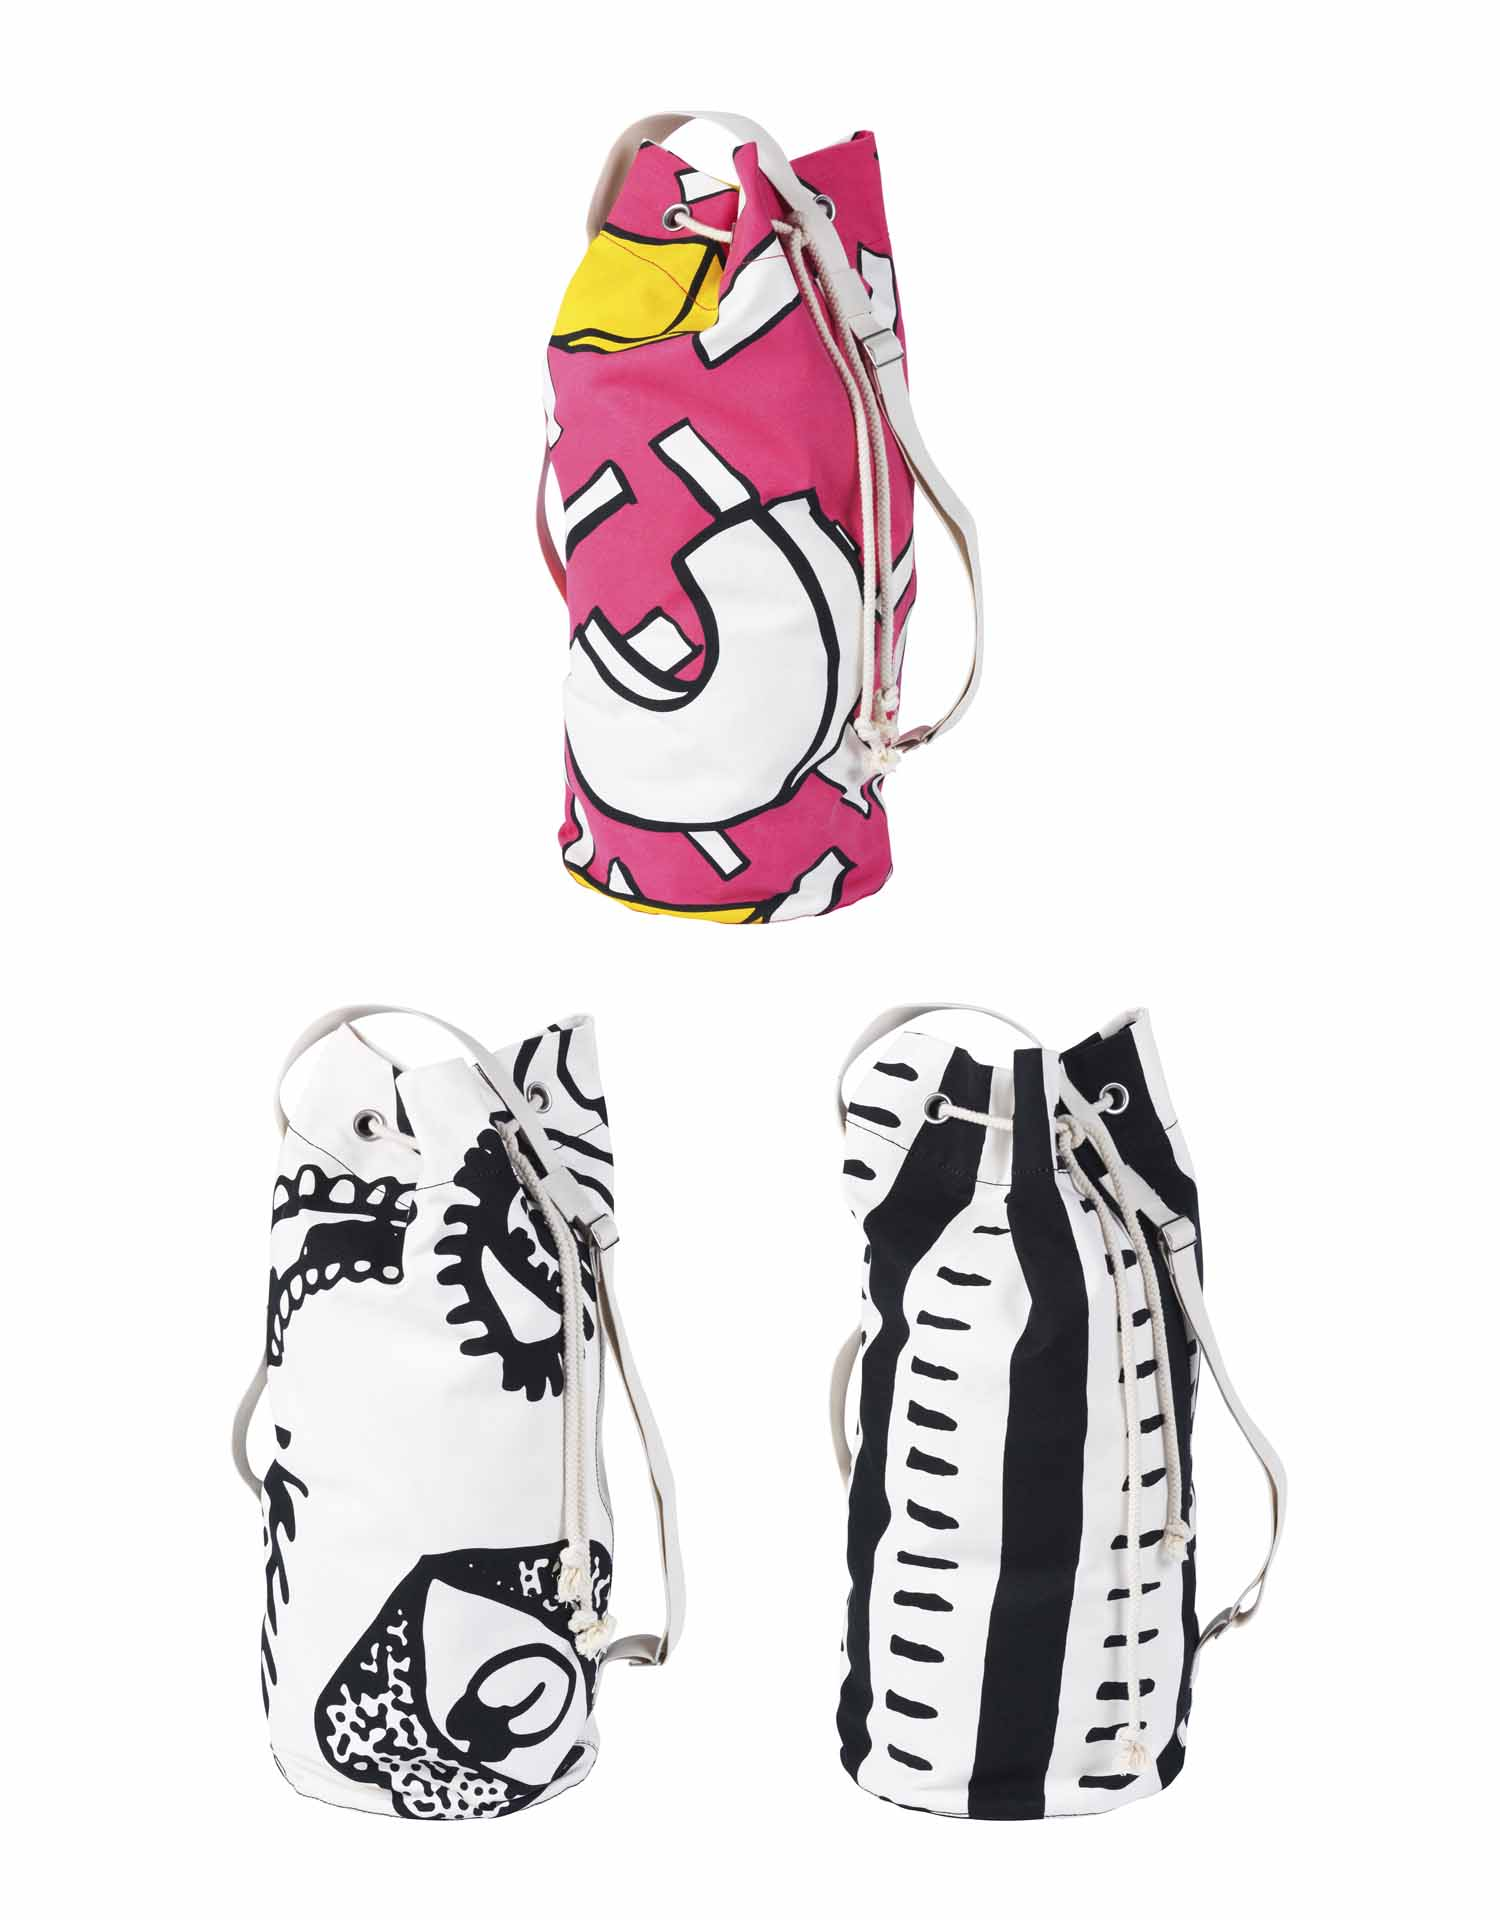 SPRIDD duffel bag - $24.99 - IKEA (3)